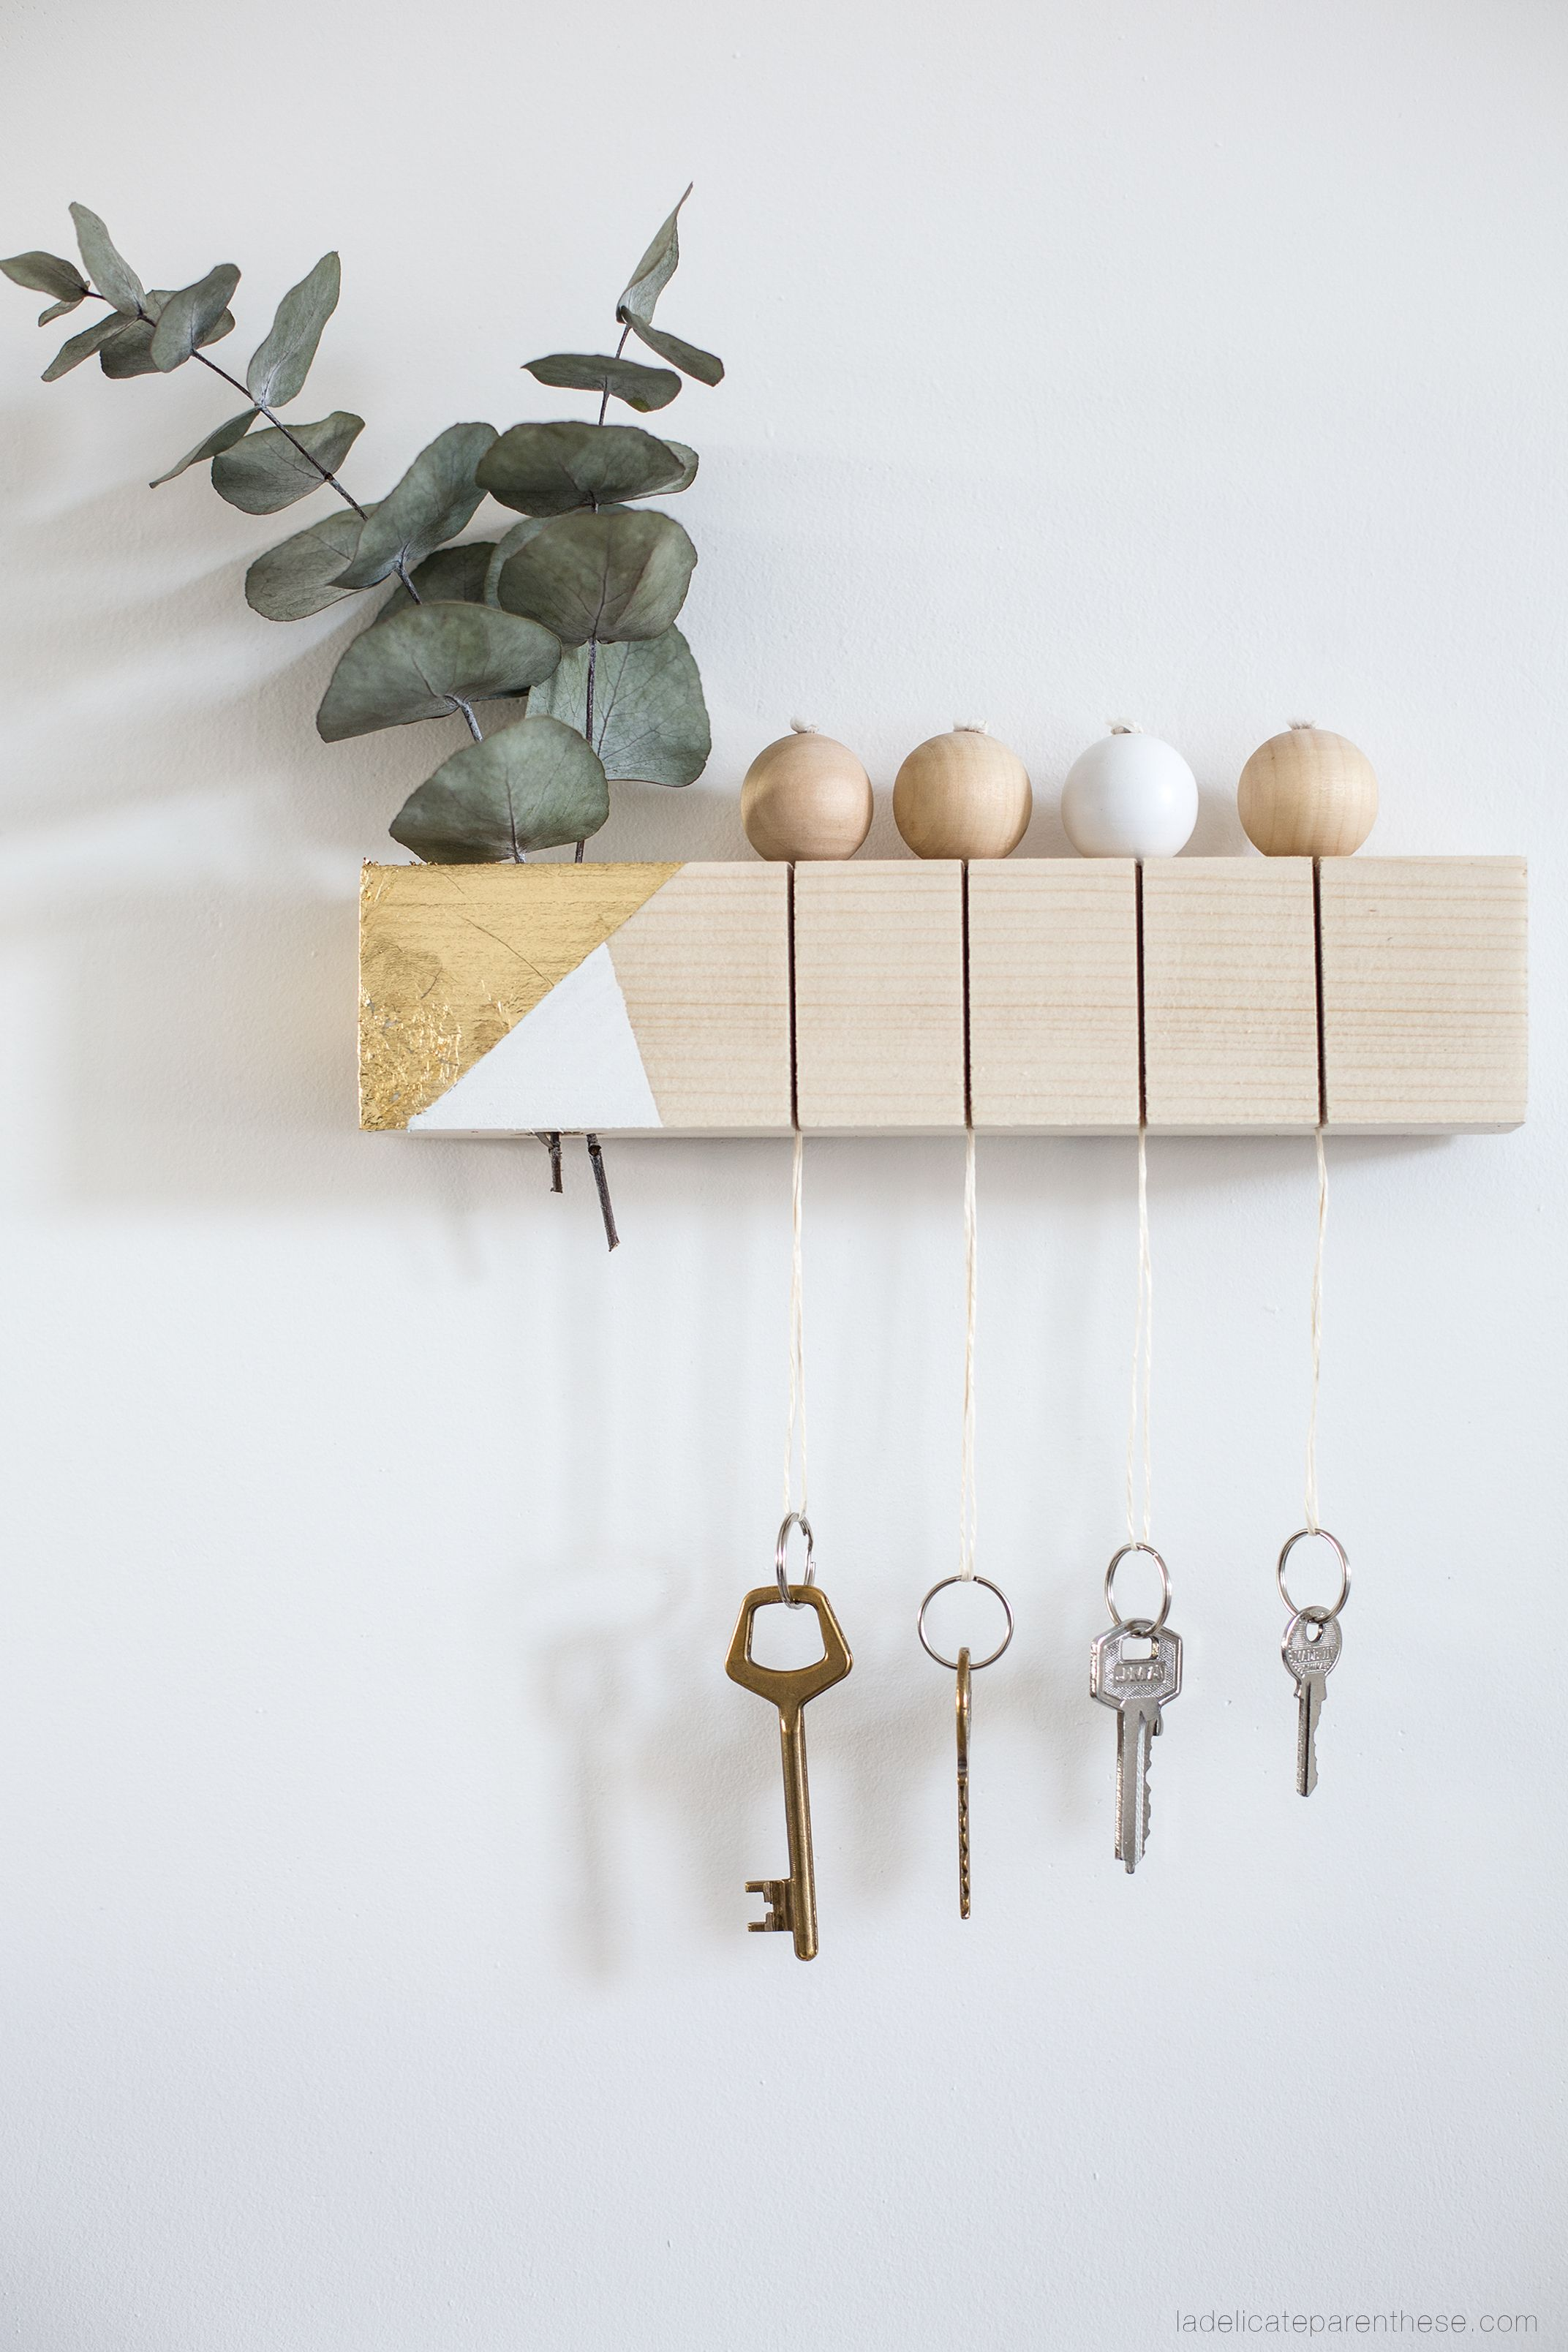 diy un tasseau de bois recycl en porte clef pur. Black Bedroom Furniture Sets. Home Design Ideas